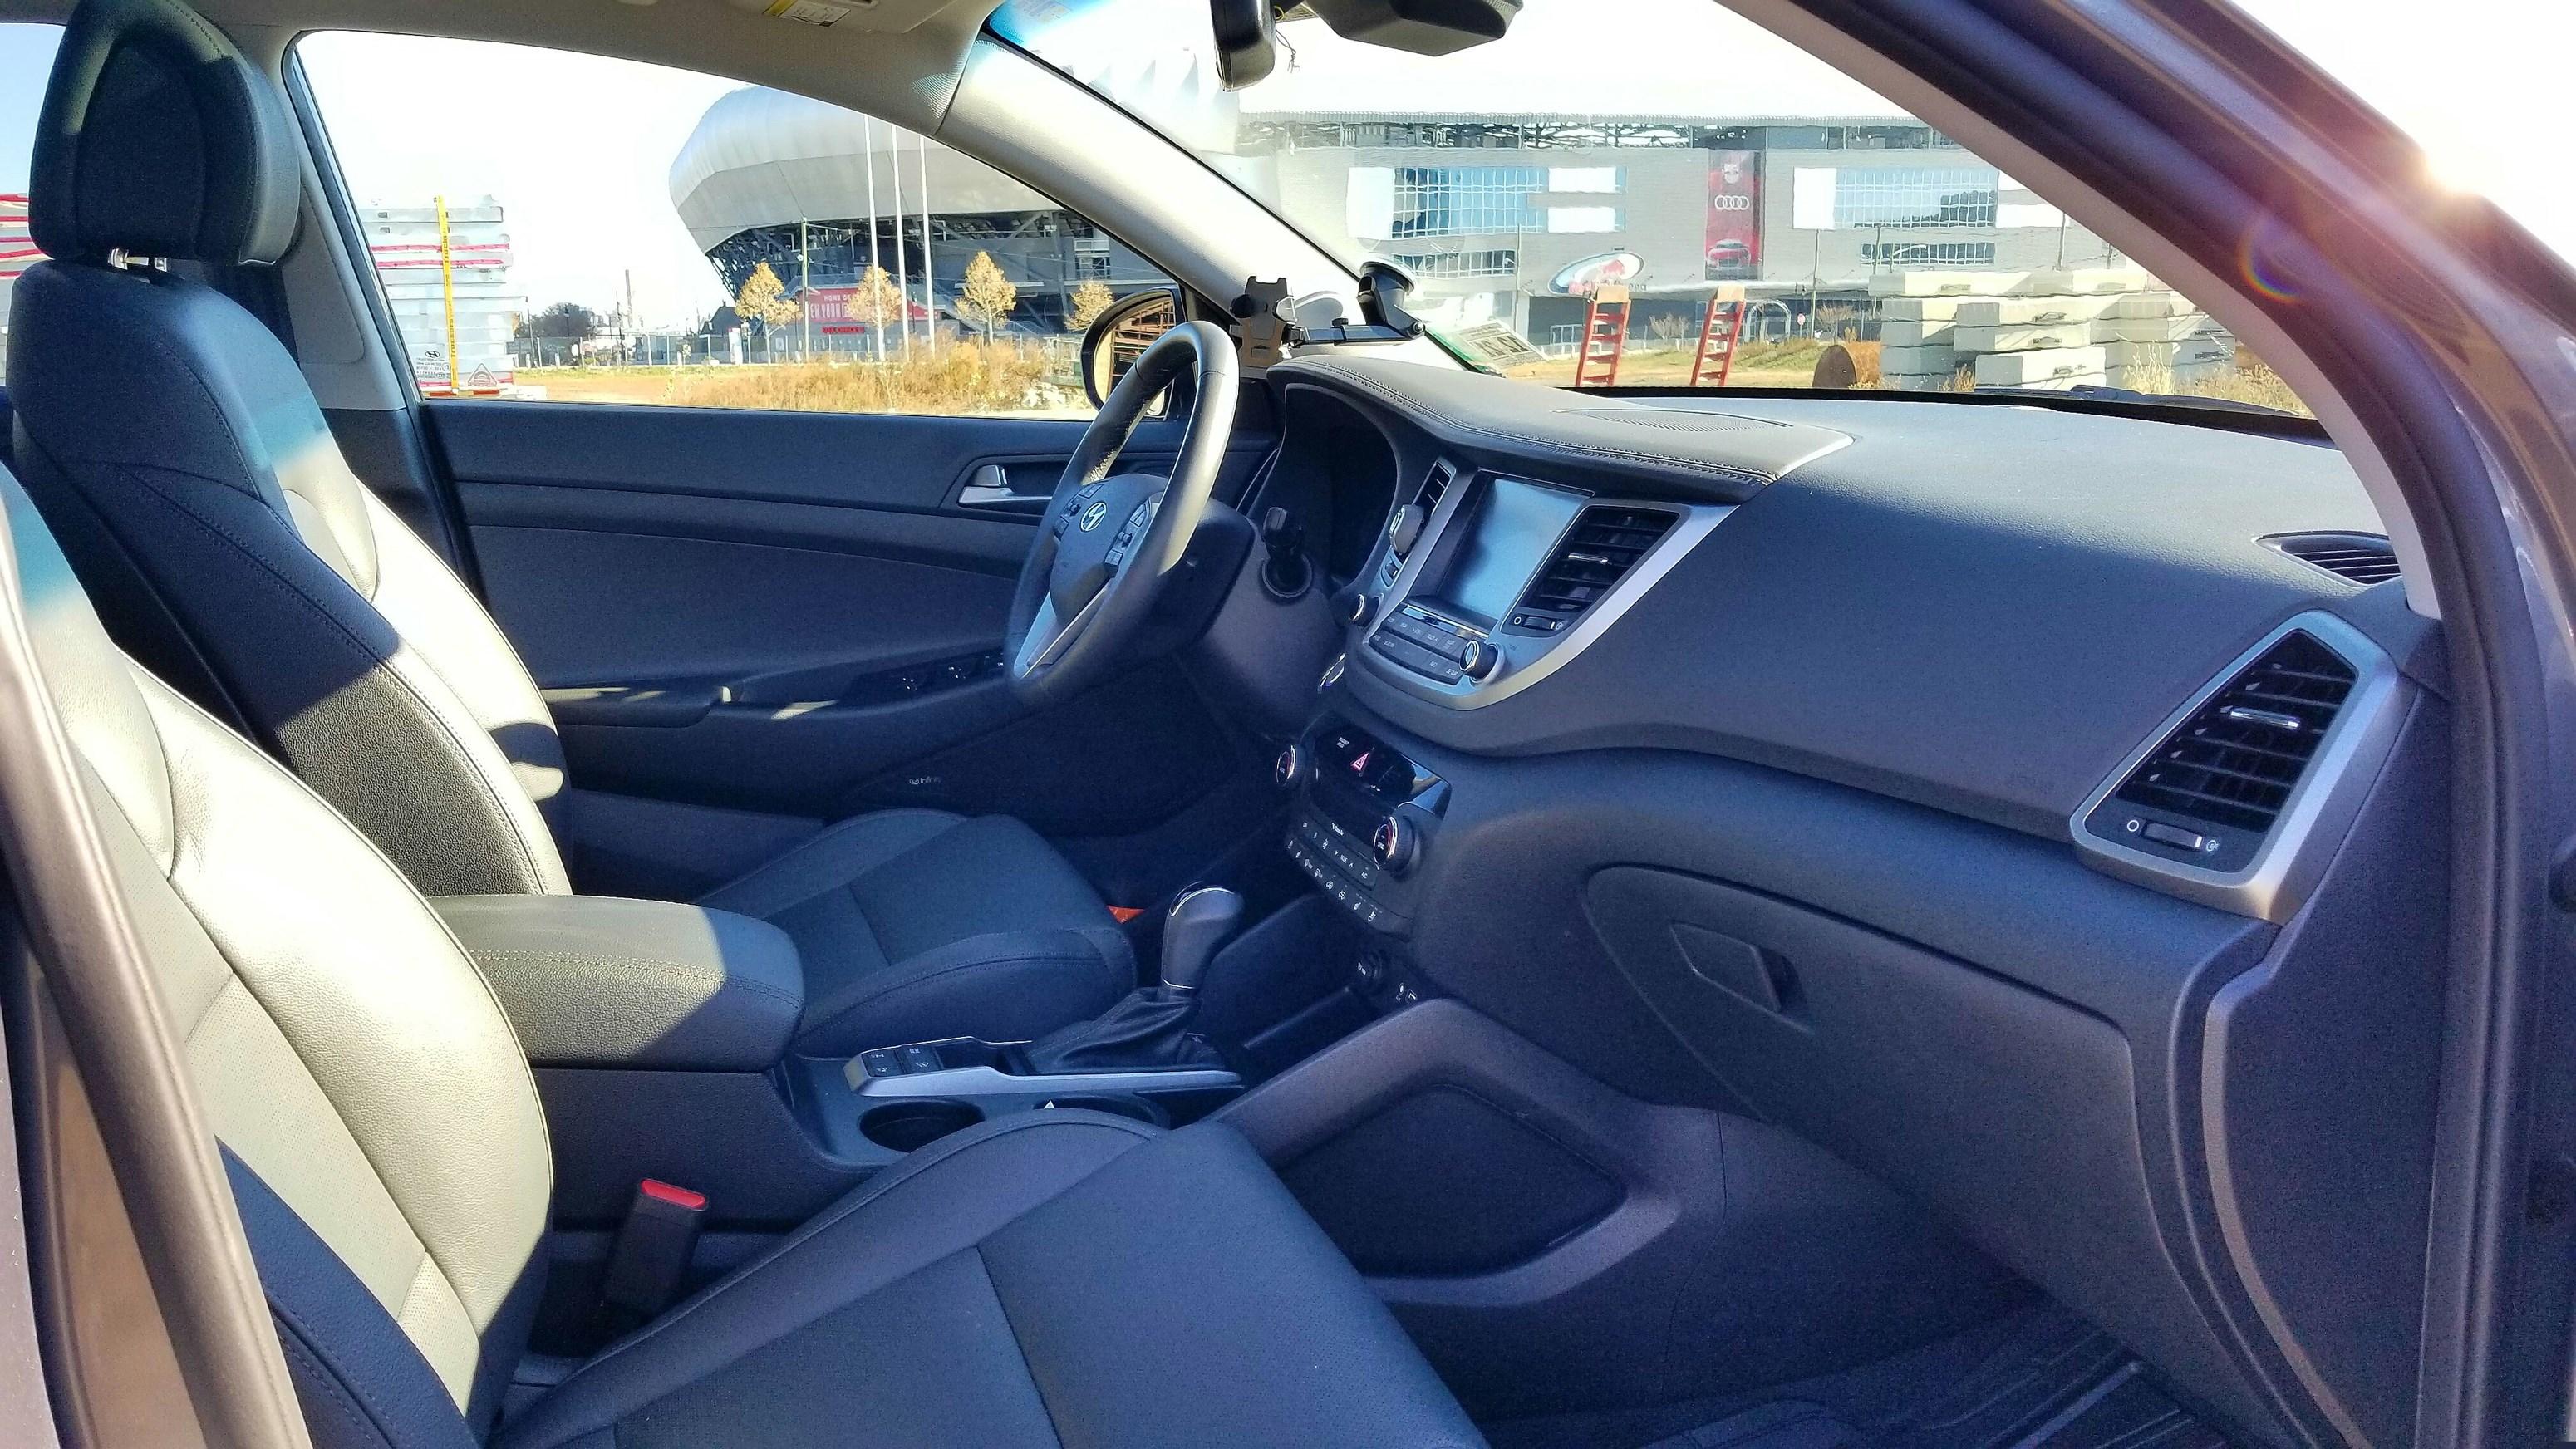 Hyundai Tucson 2017 Limited Edition Used Hyundai Tucson Cars in